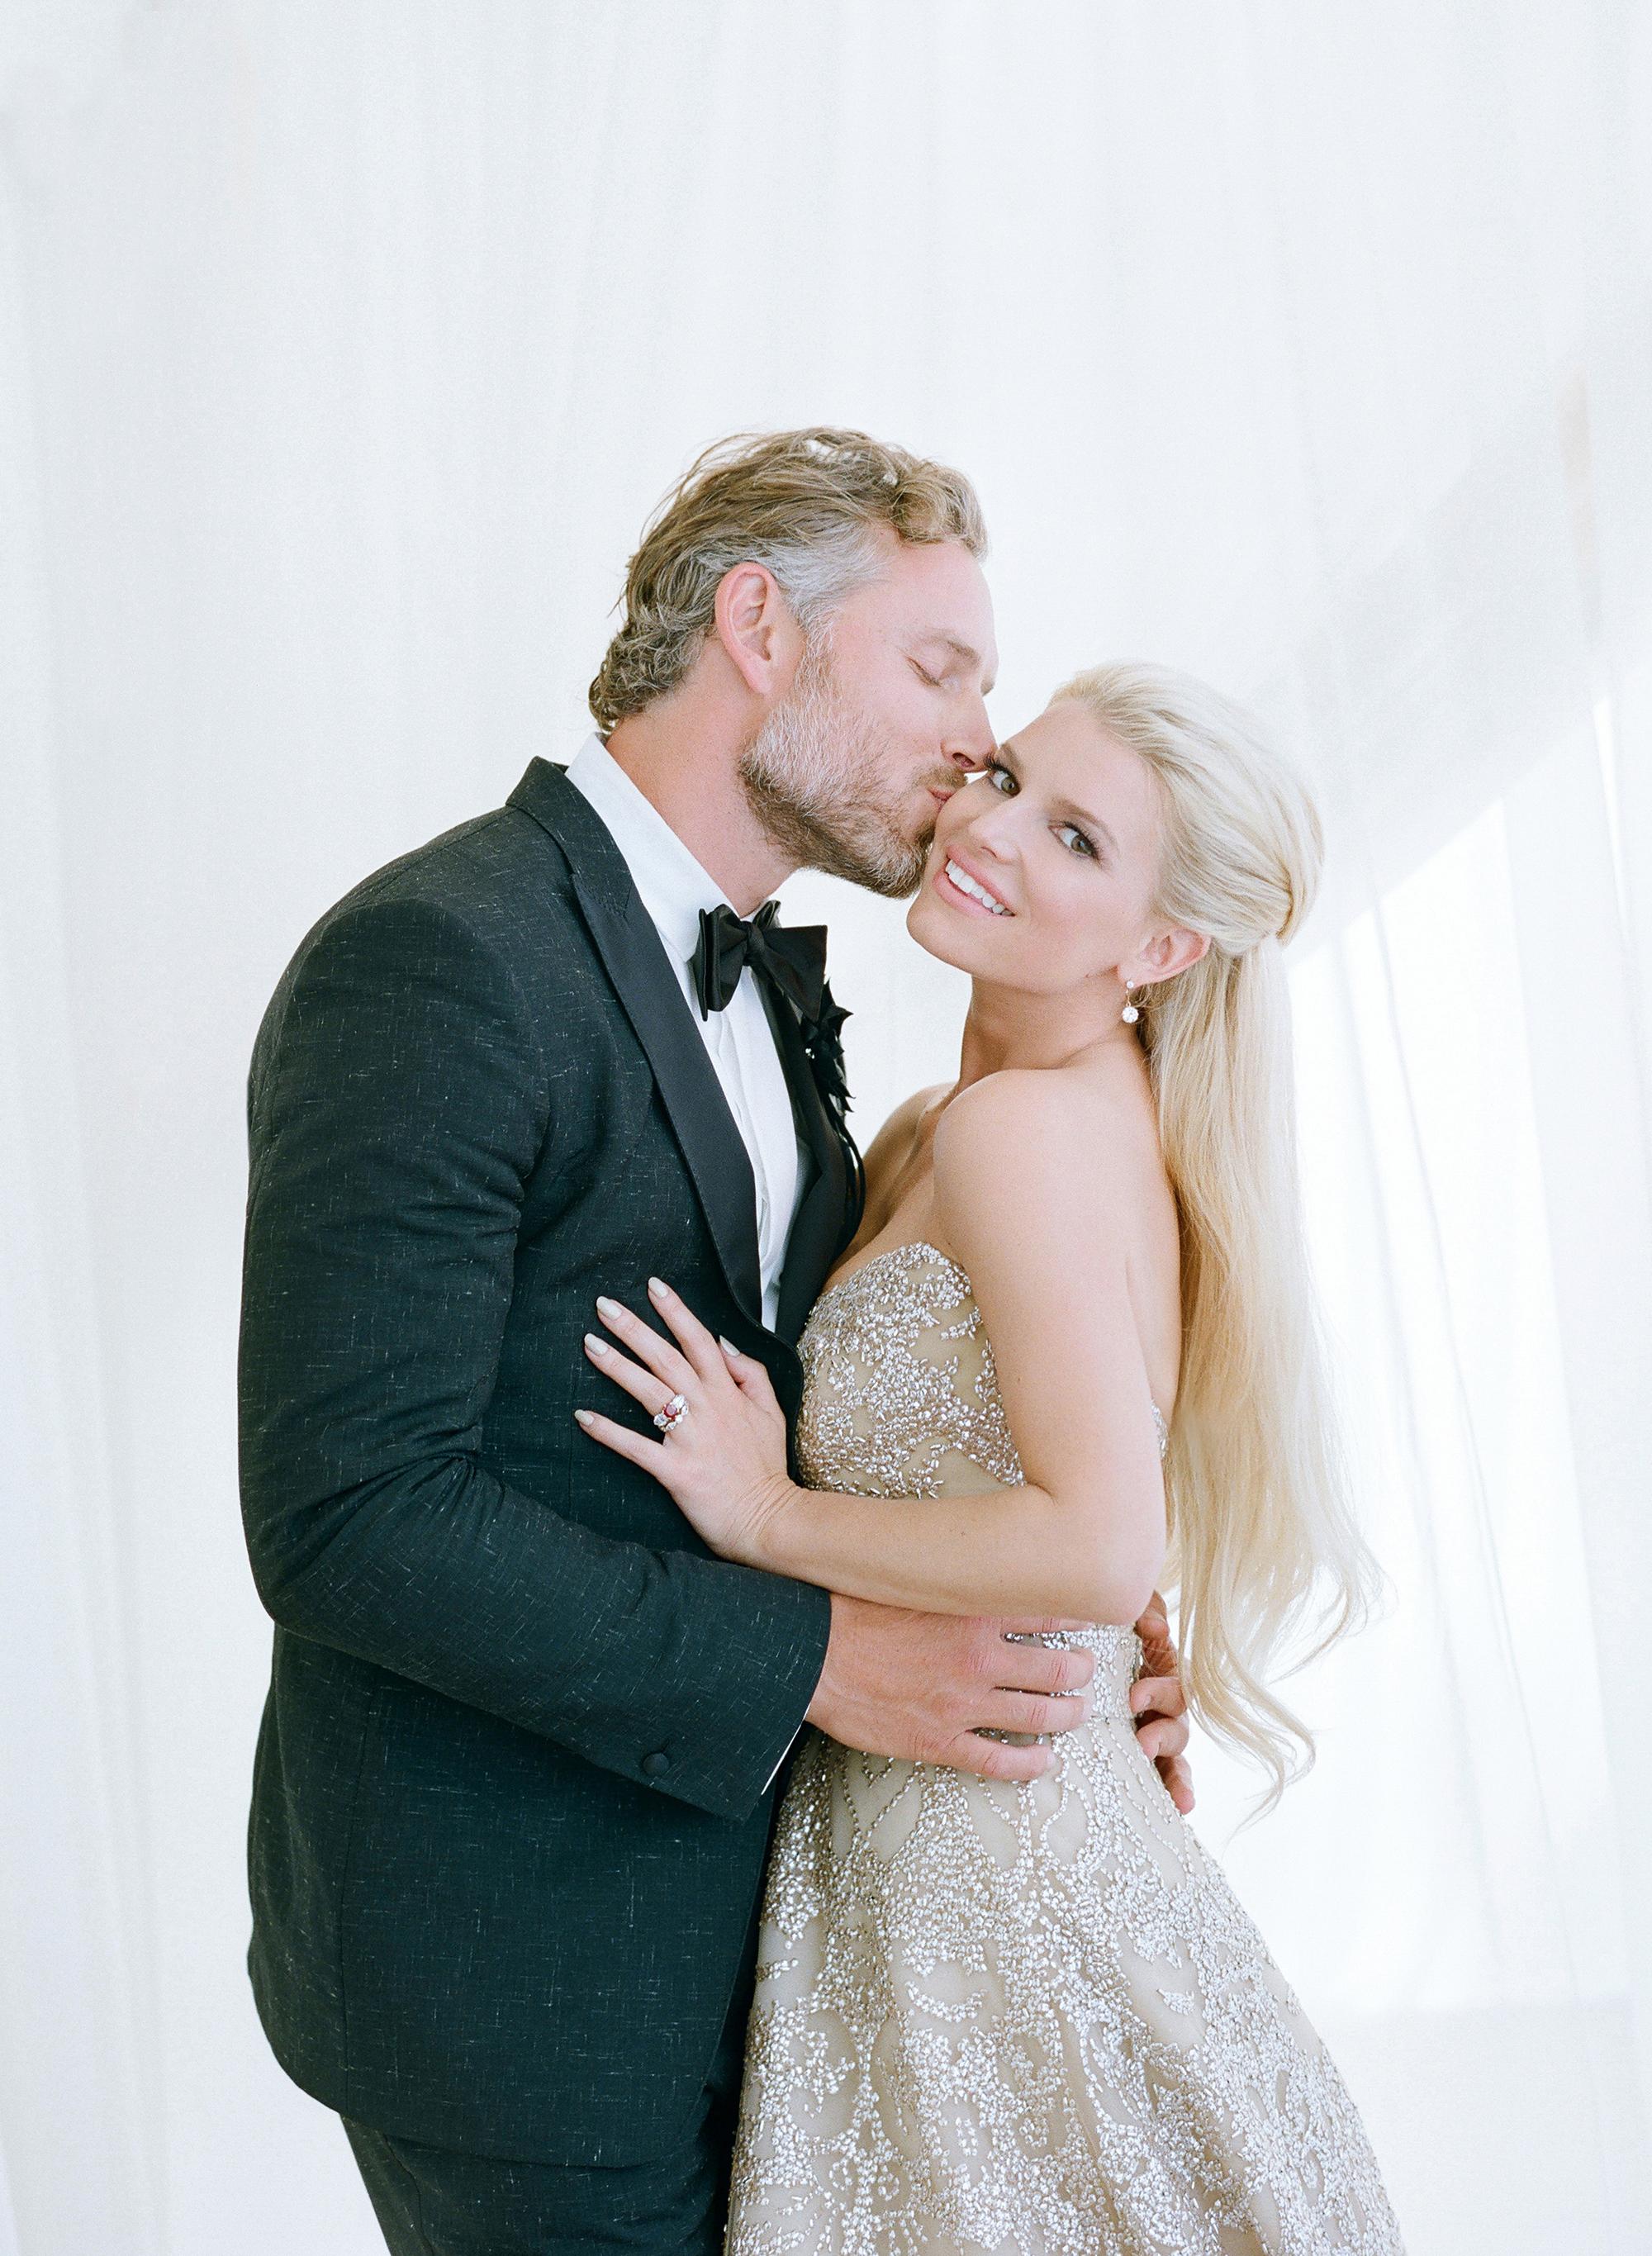 jessica simpson and eric johnson wedding